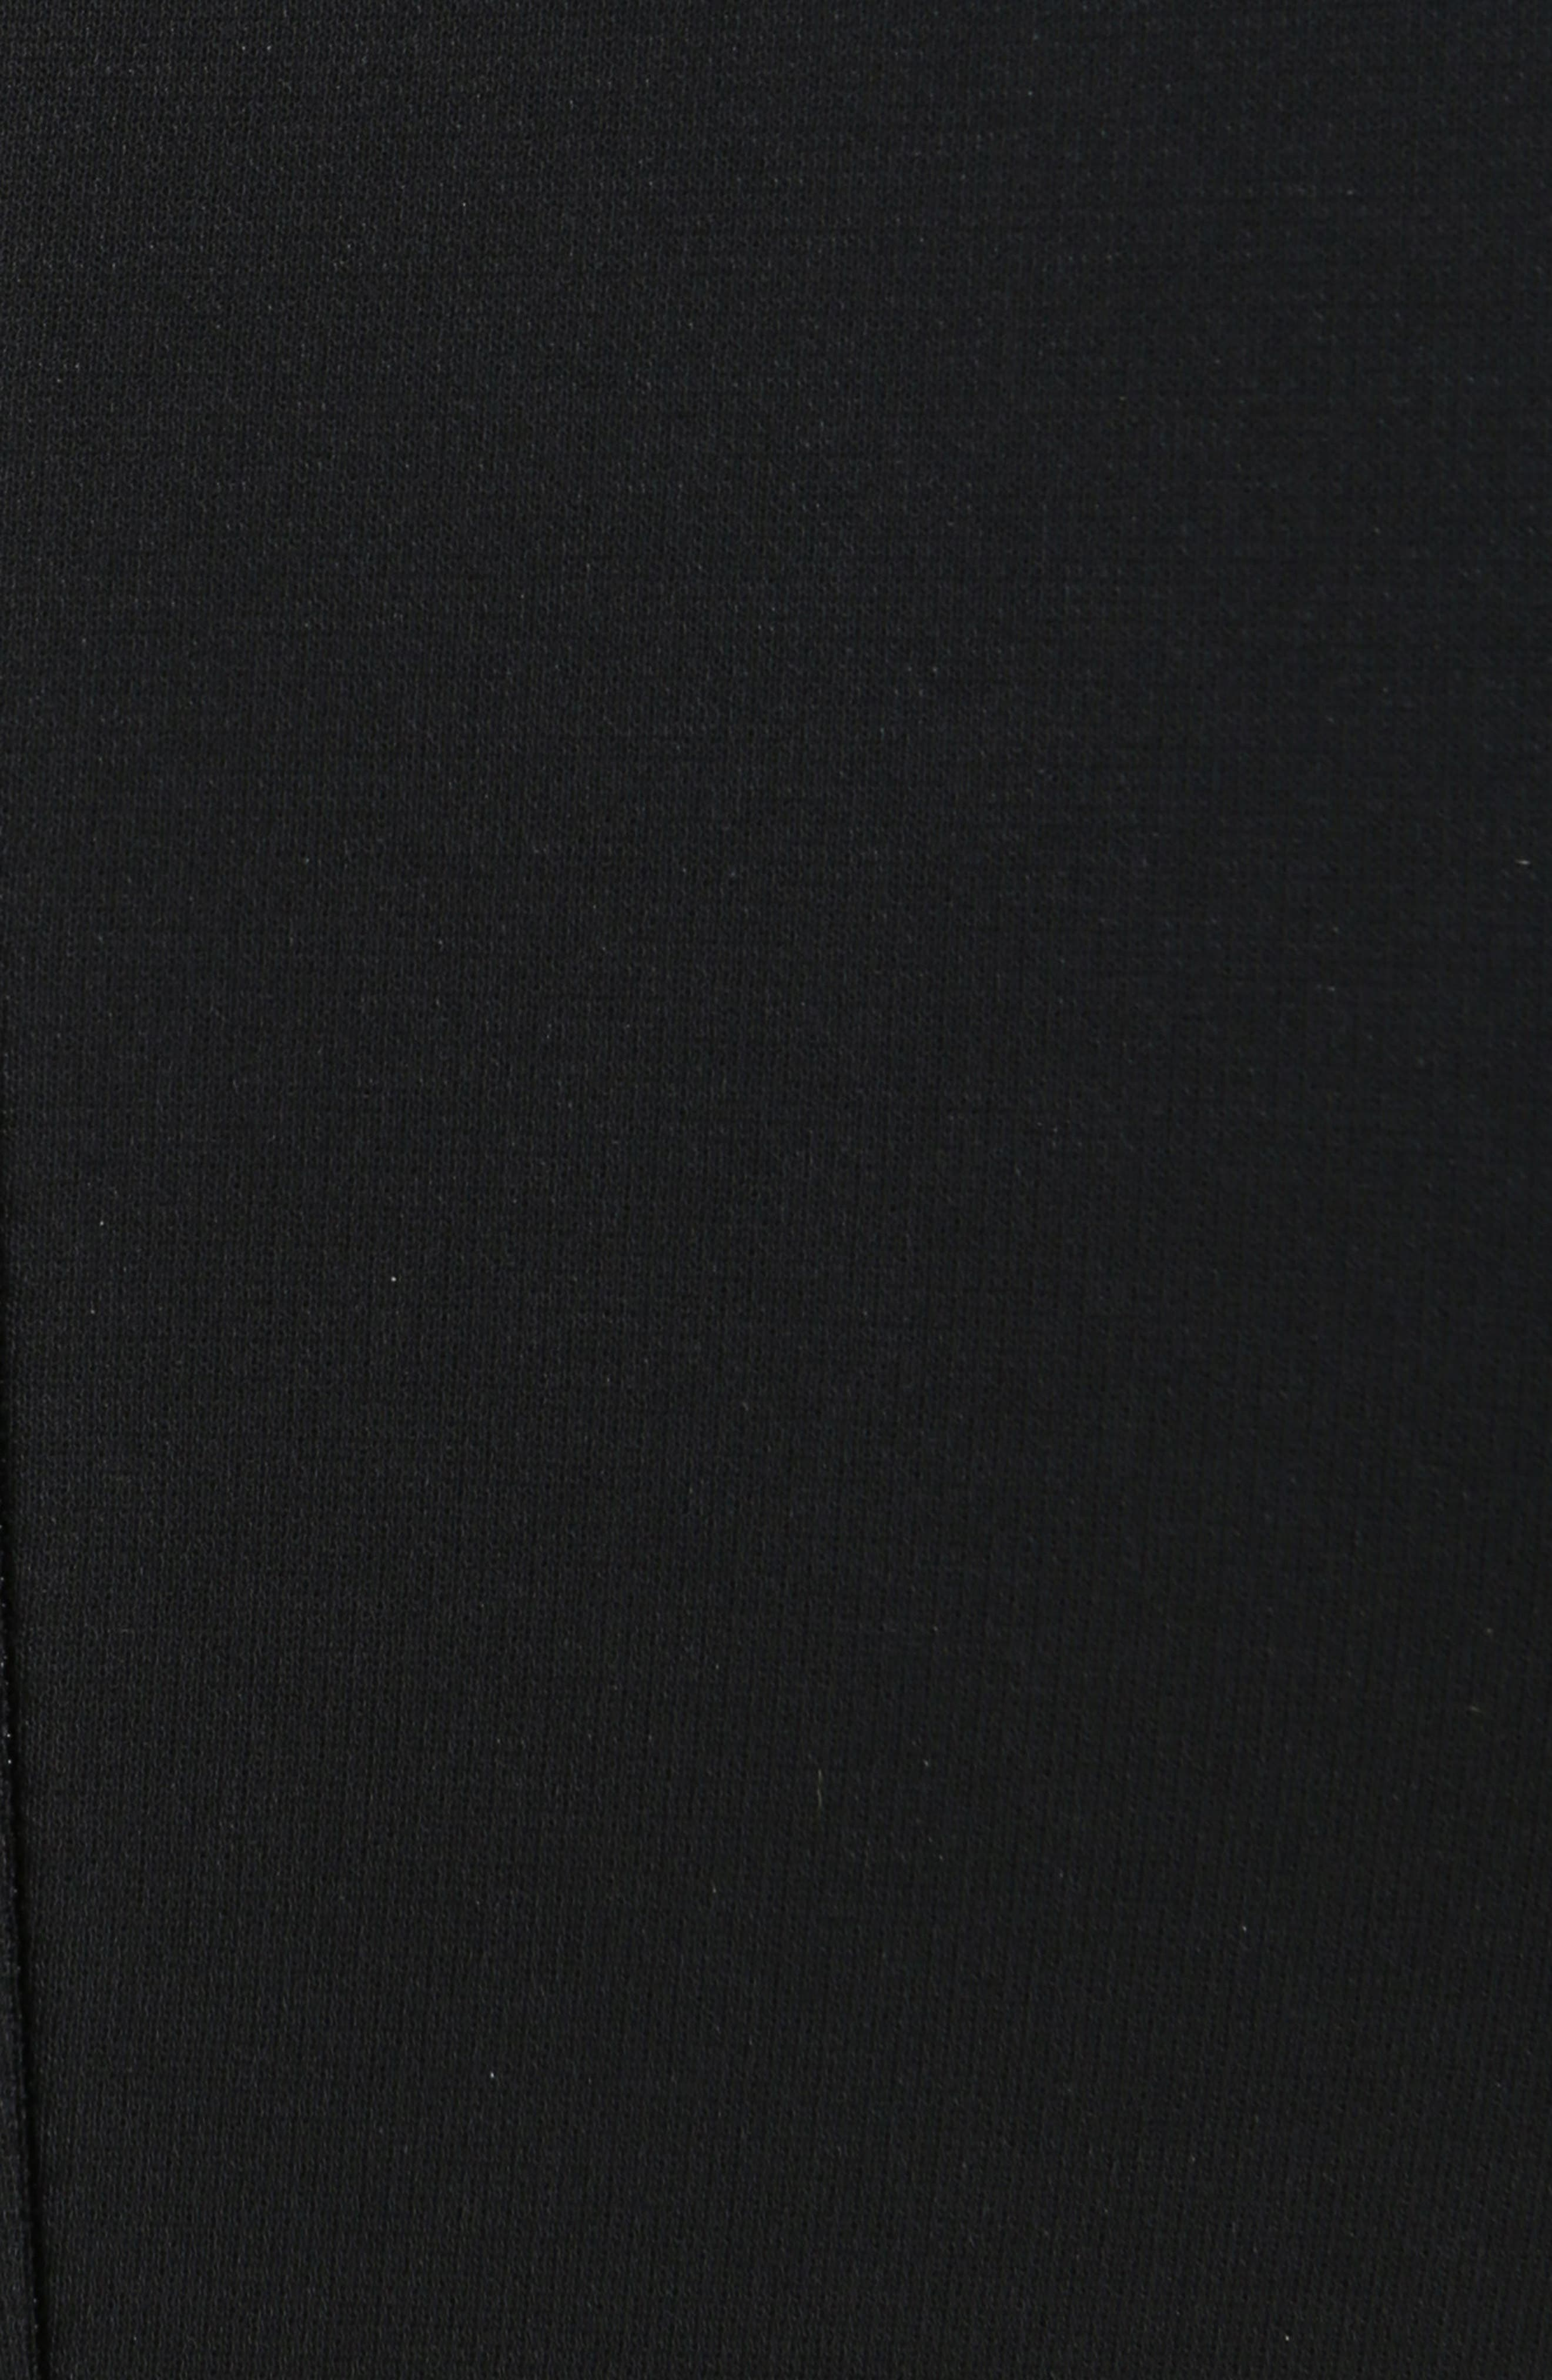 Alternate Image 3  - Givenchy Bicolor Ruffle Crepe Dress